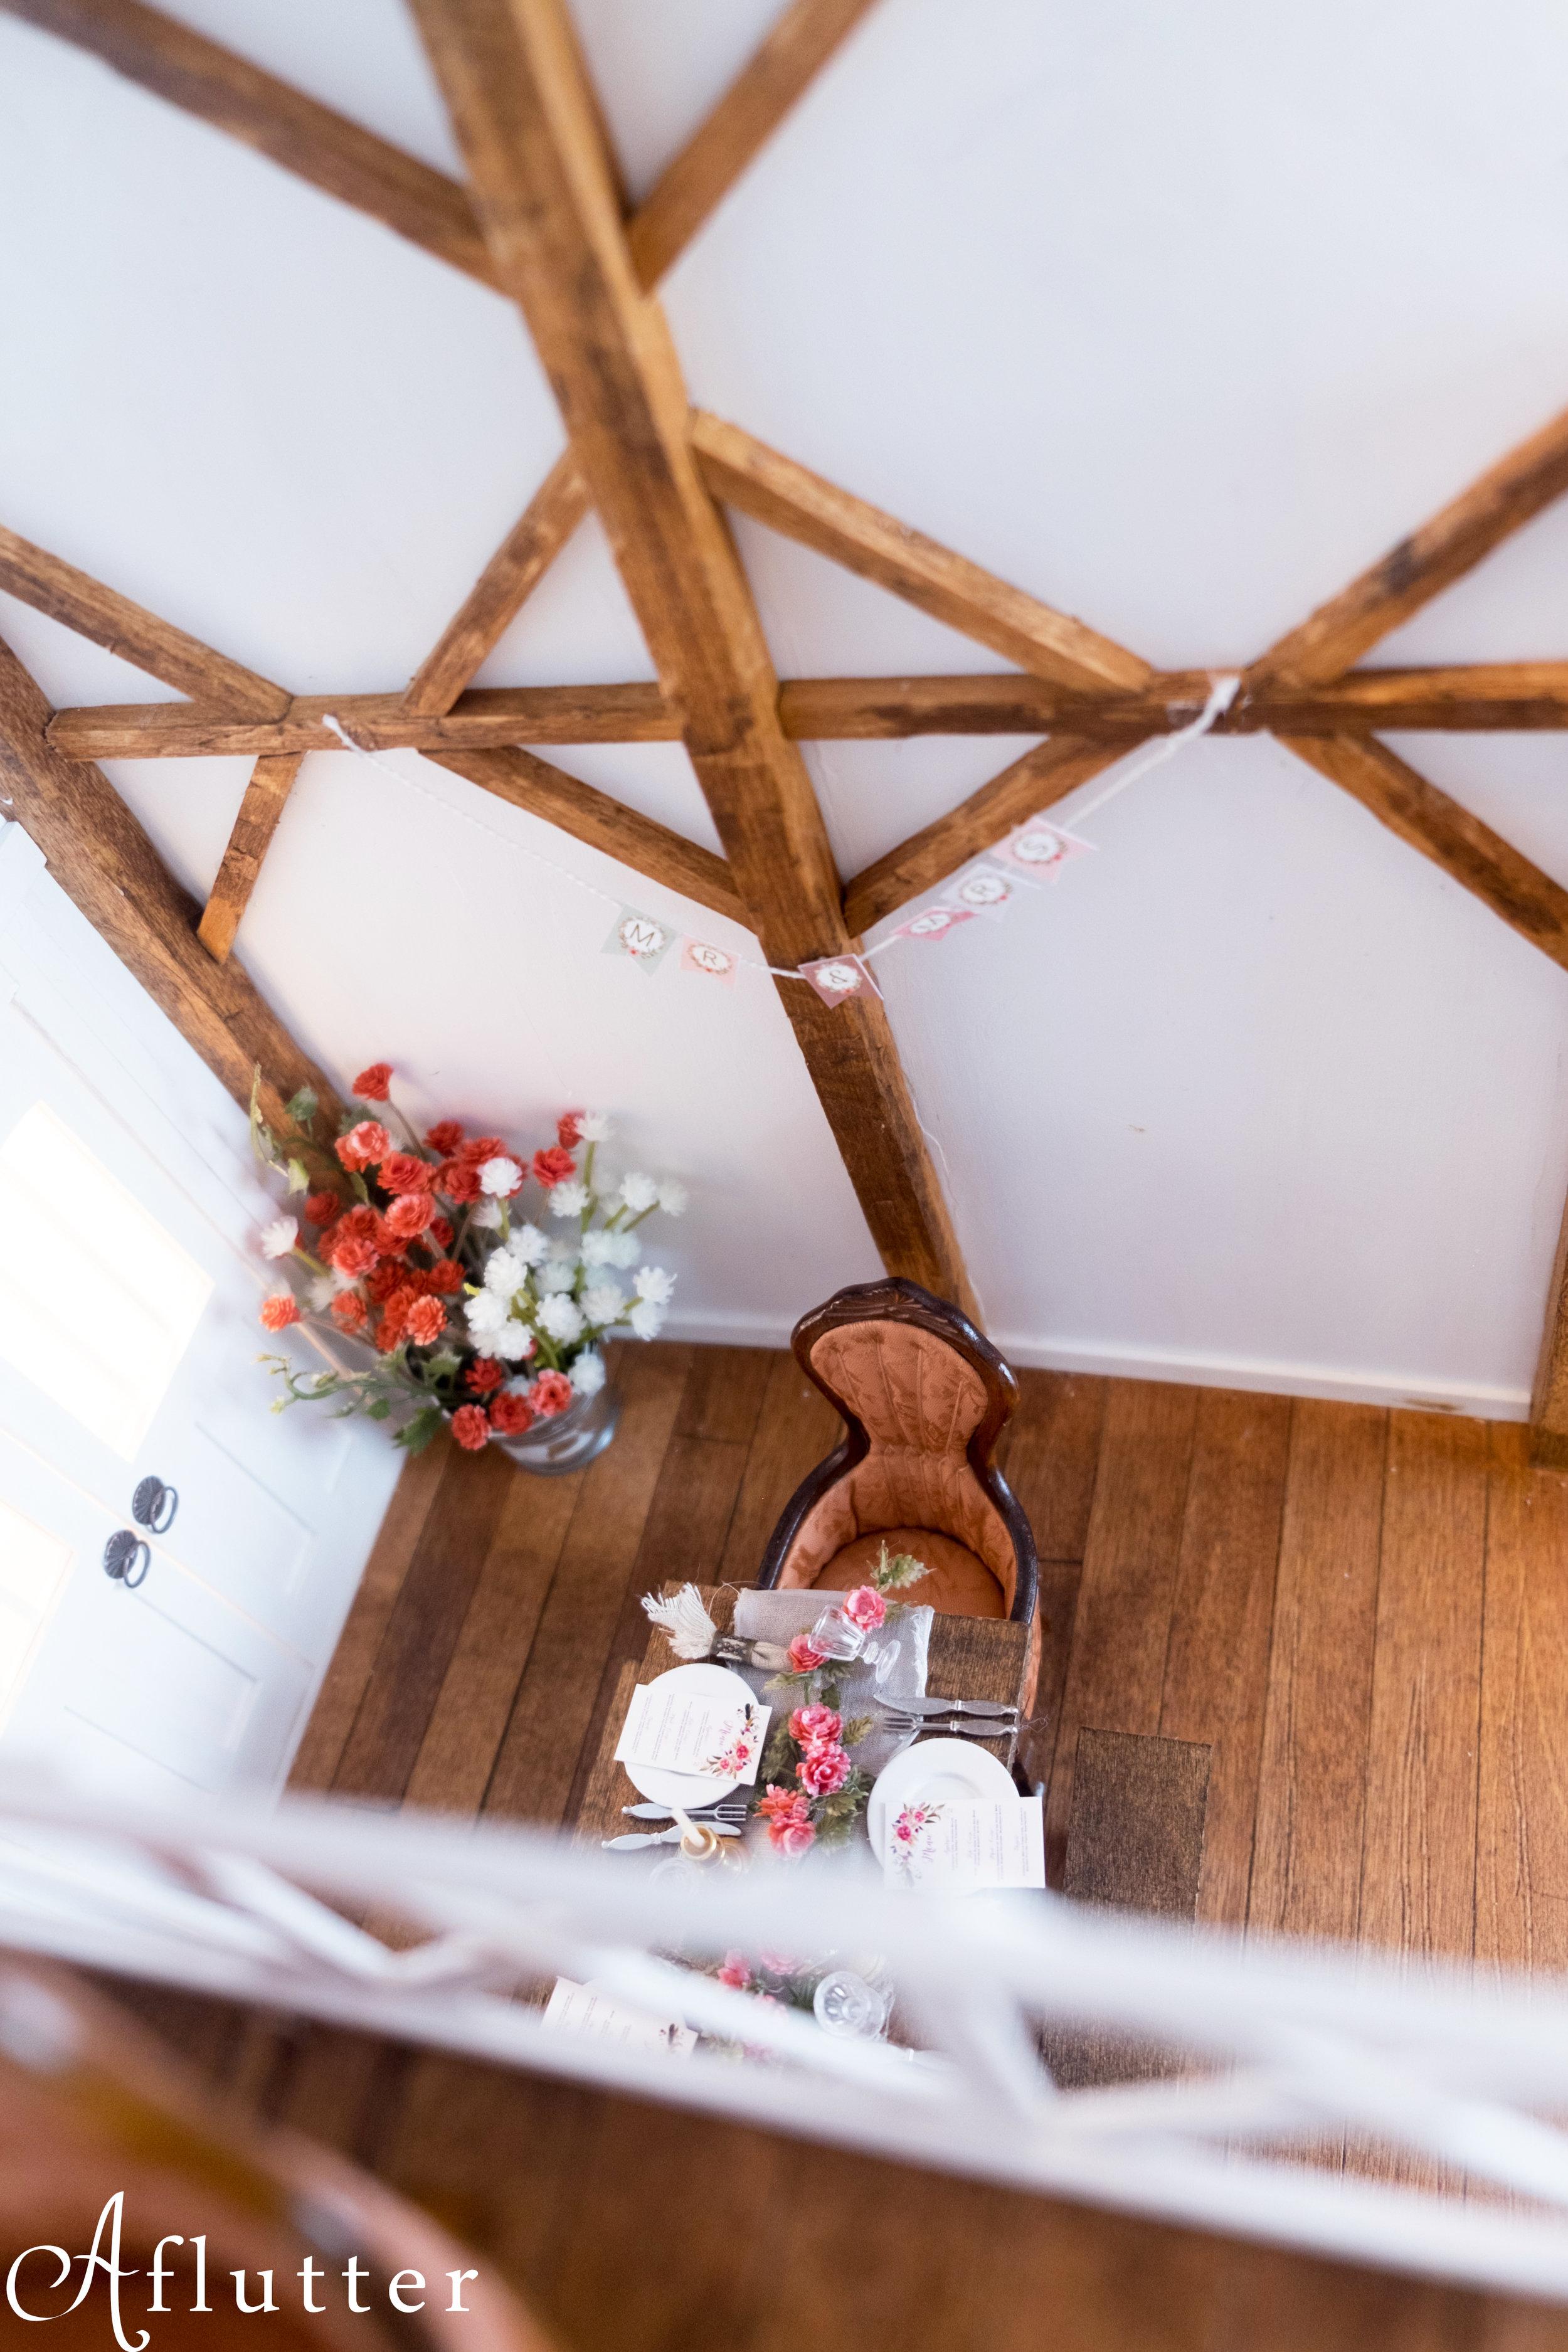 Brenul-Barn-Mini-Wedding-1-of-1.jpg